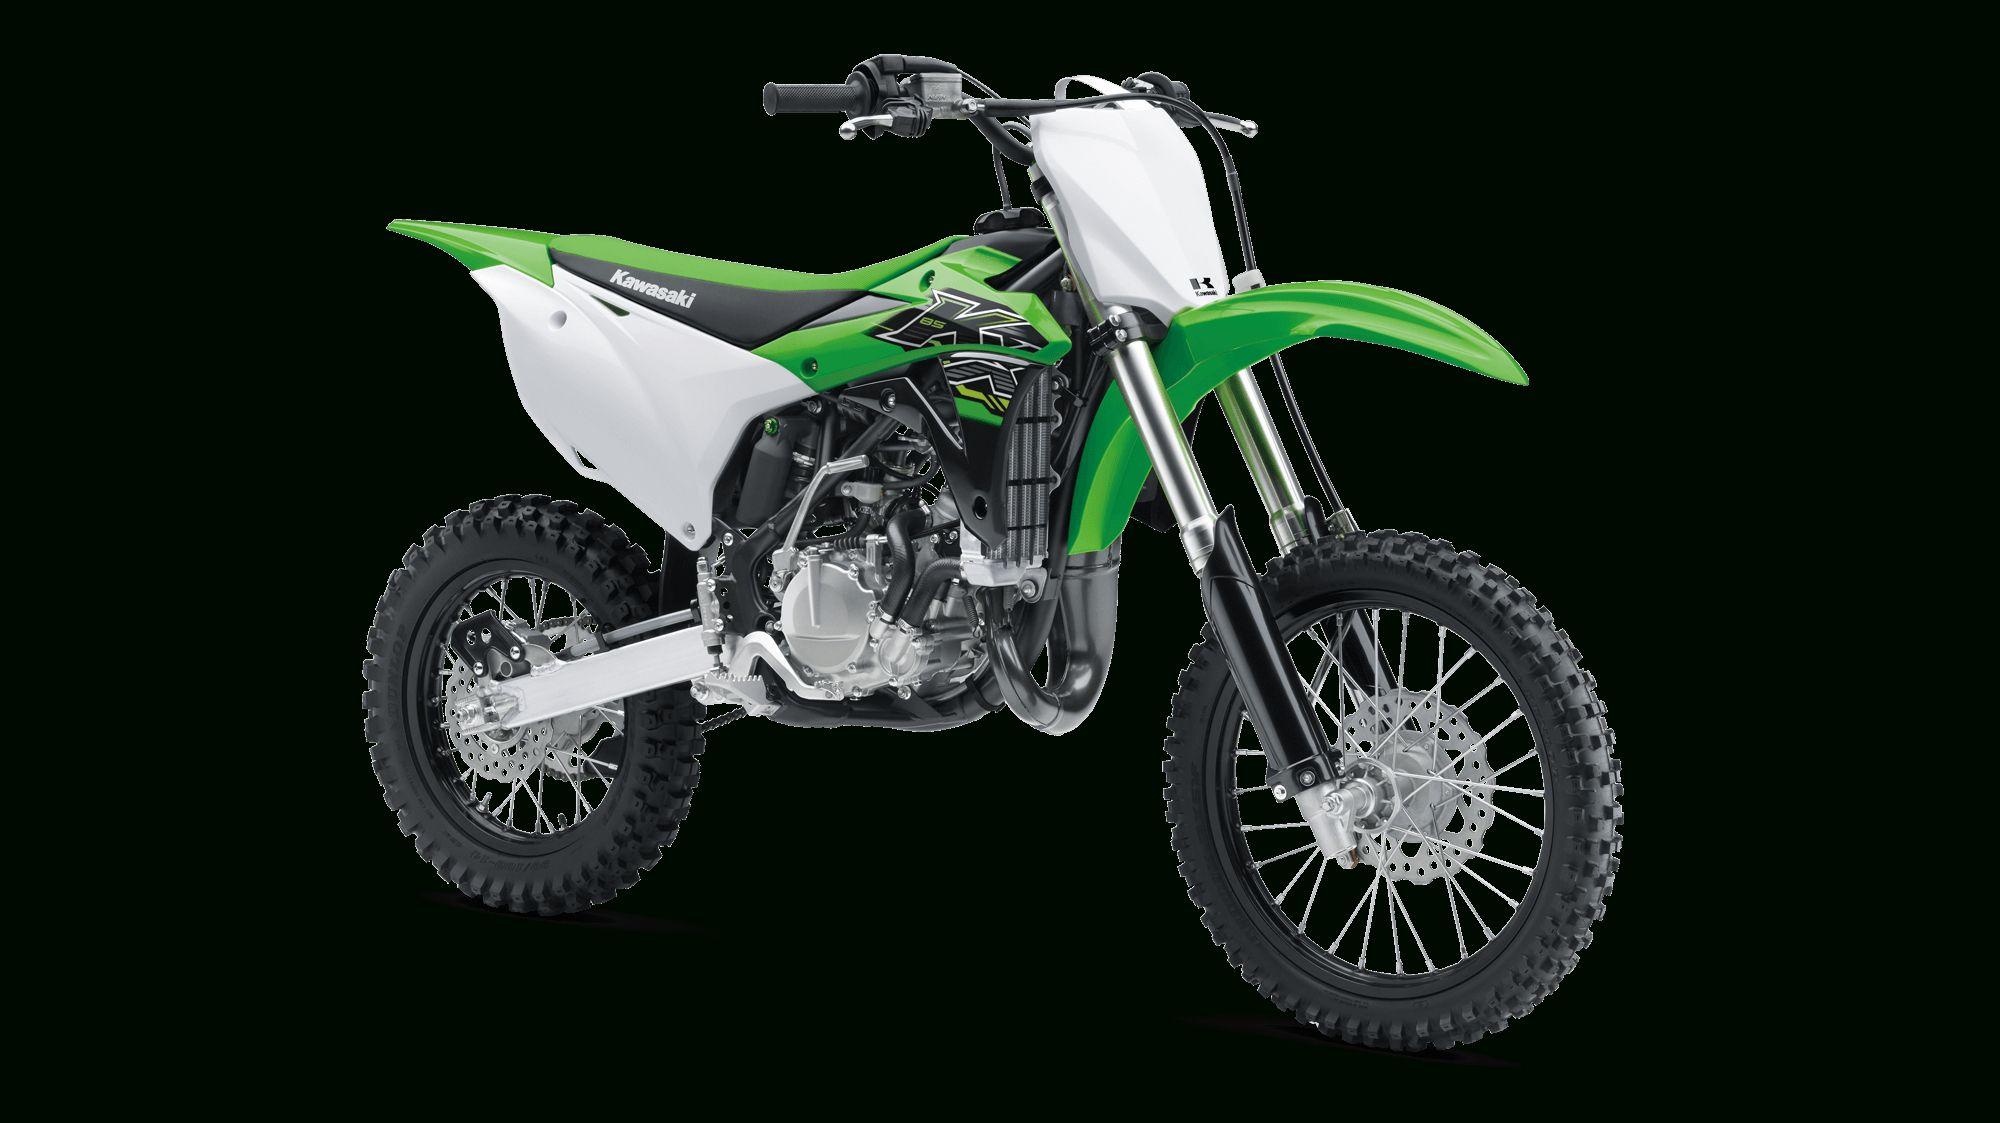 Kawasaki 85cc 2019 Pictures From 2019 Kx 85 Kx Motorcyclekawasaki